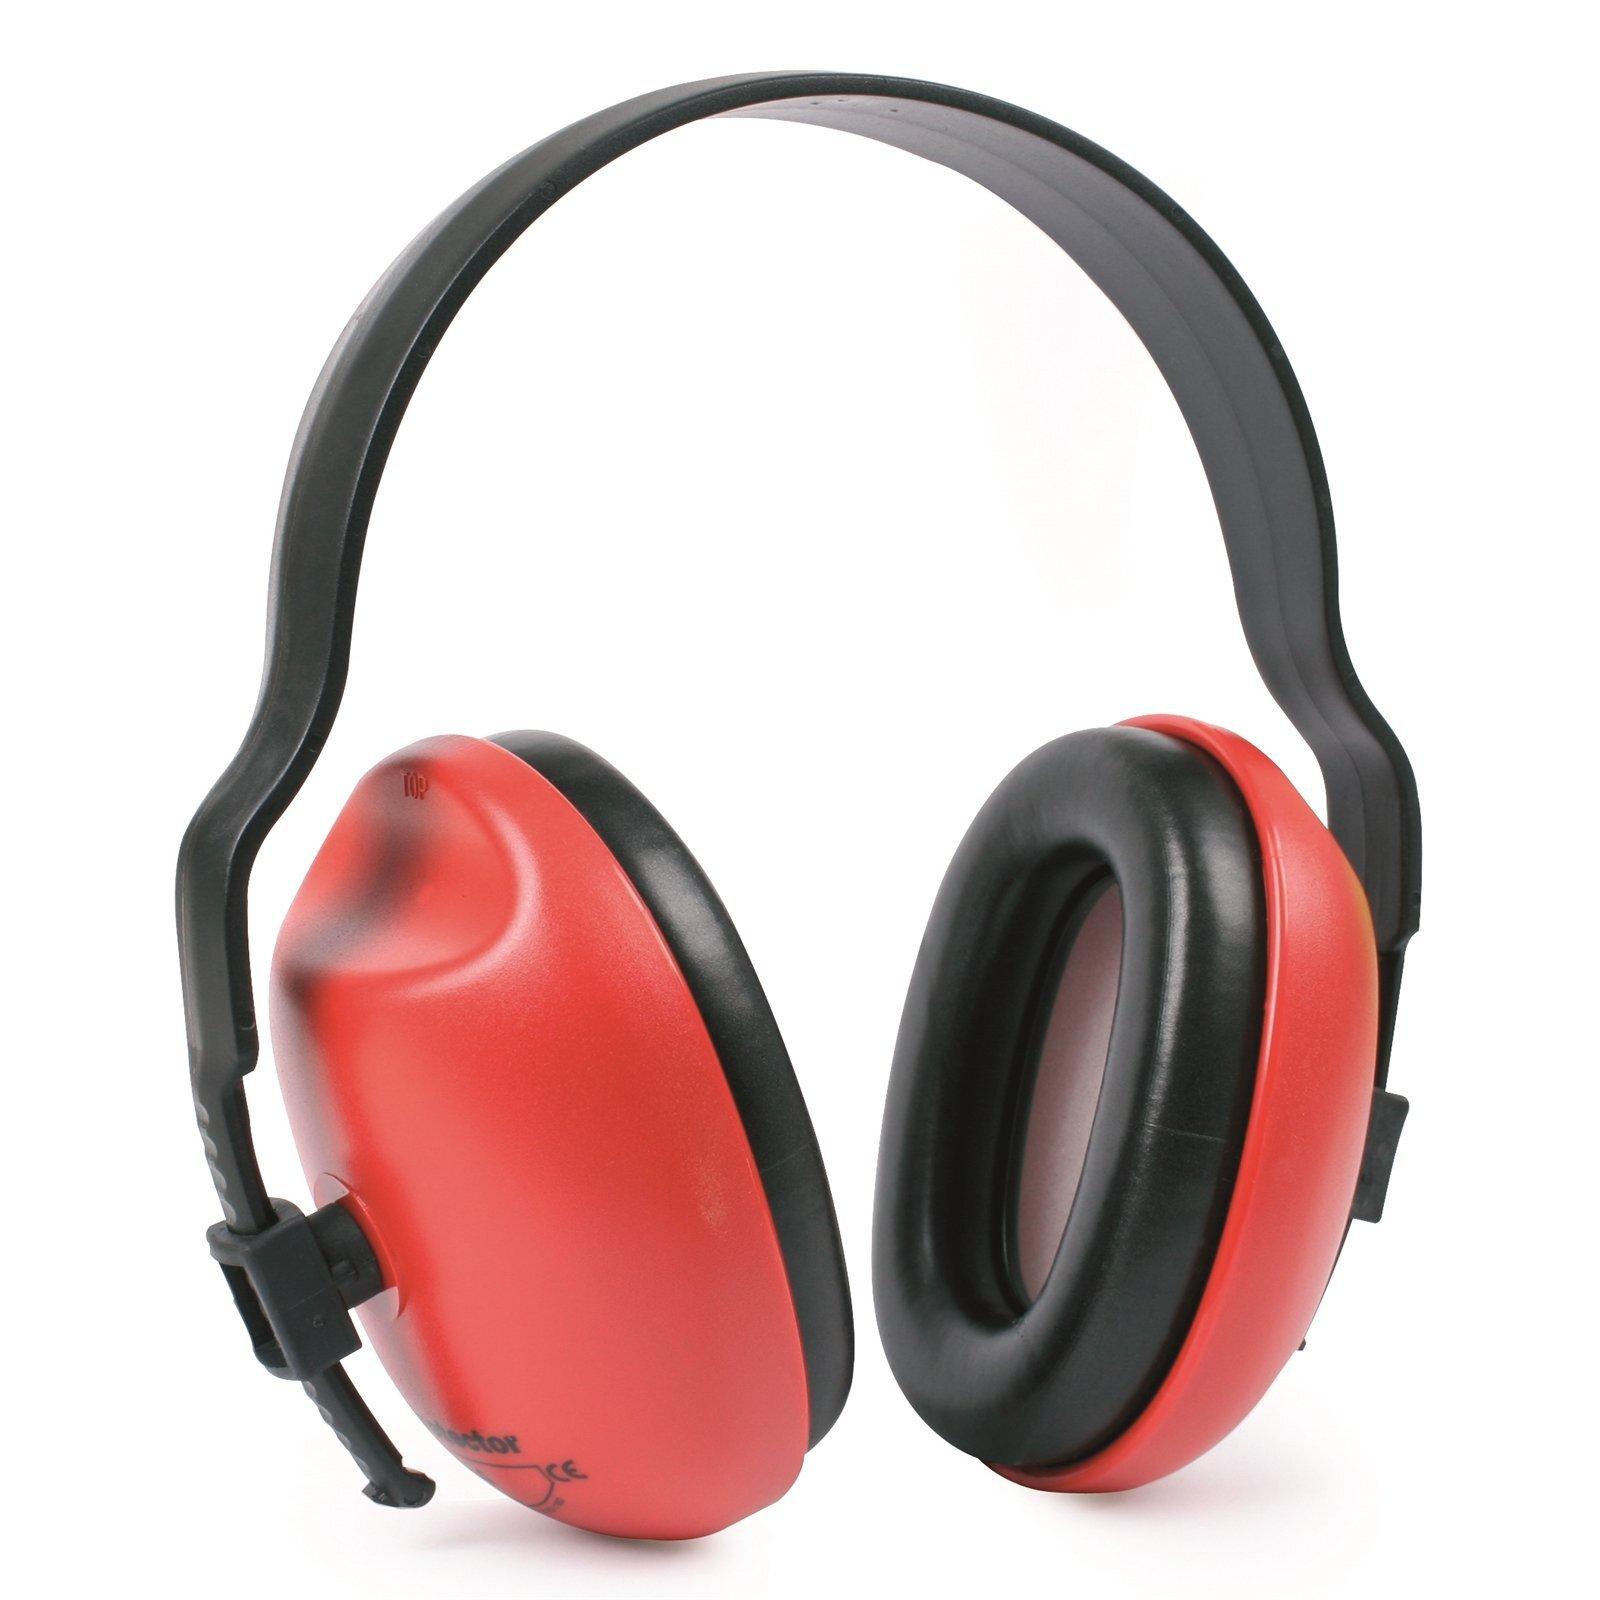 Protector Tradesman Ear Muffs